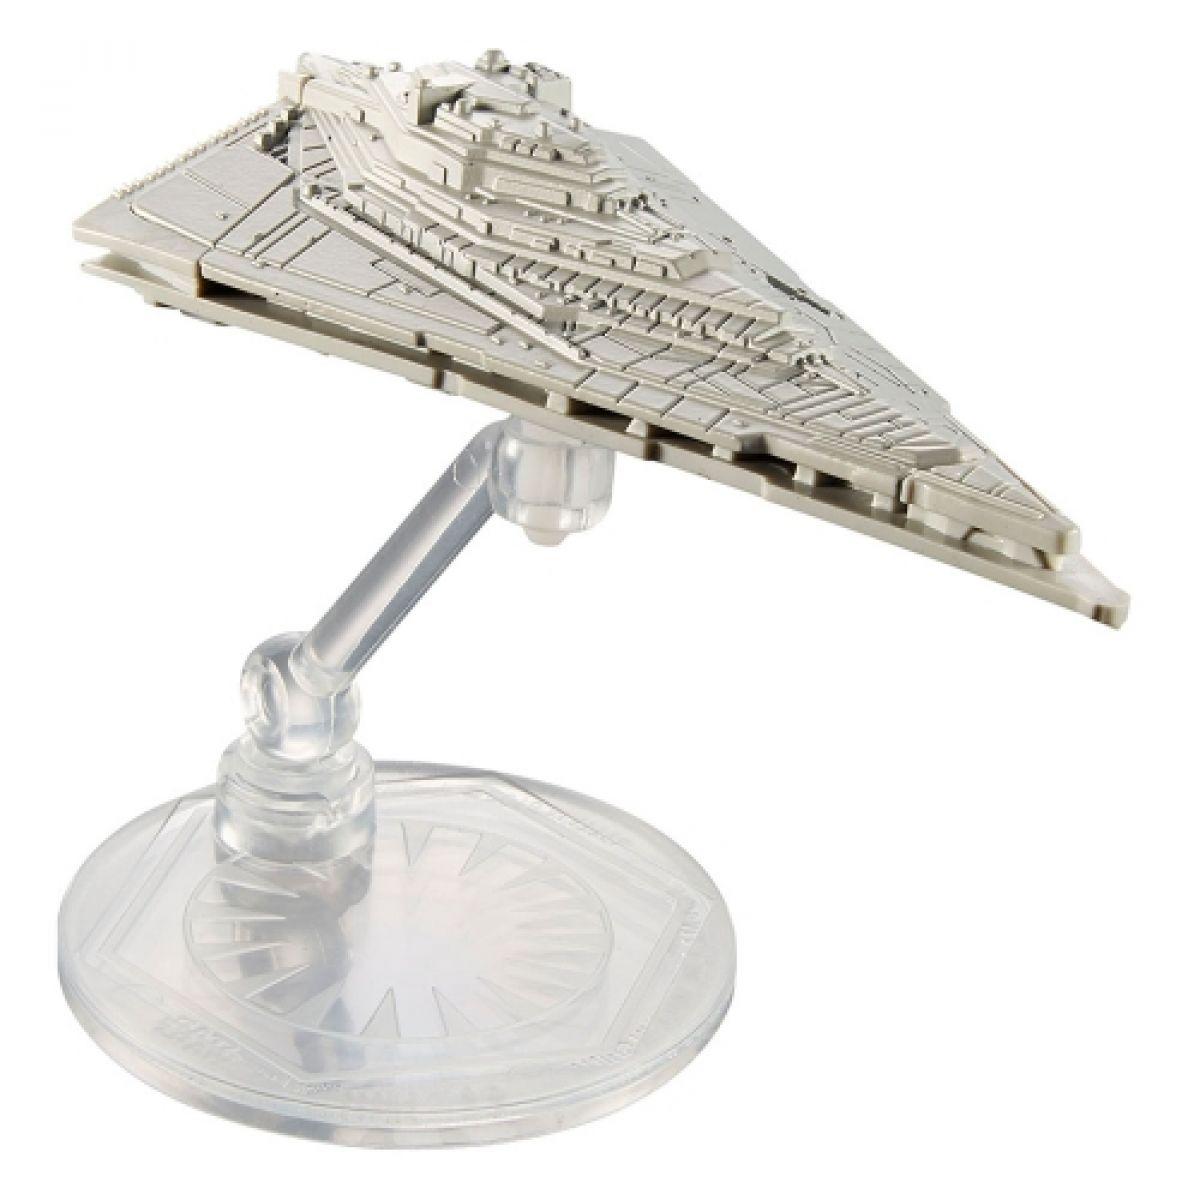 Hot Wheels Star Wars Starship 1ks - Star Destroyer DXX57